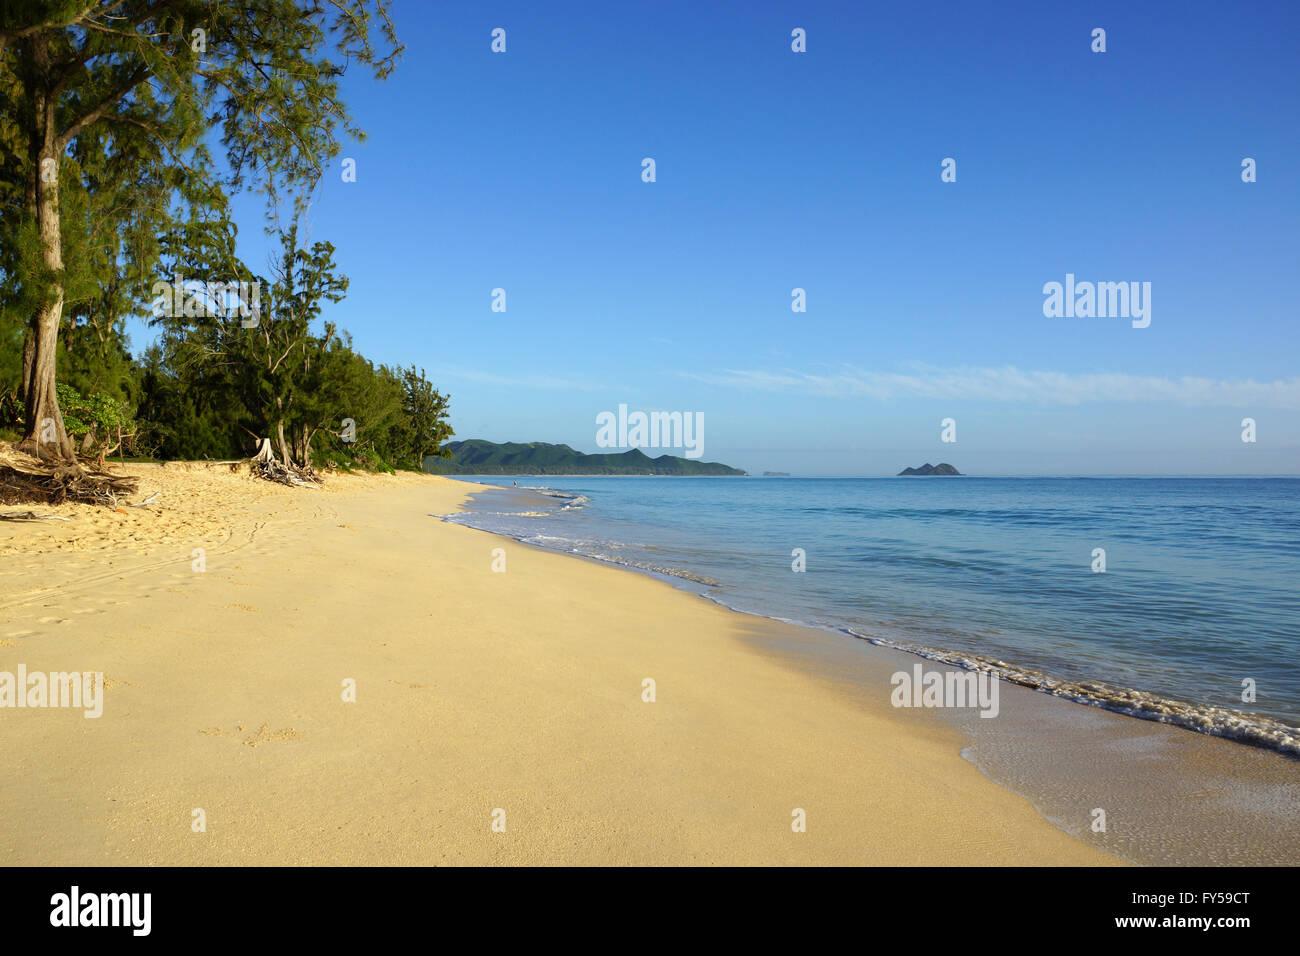 Gentle wave lap on Waimanalo Beach looking towards Mokulua islands on a nice day Oahu, Hawaii. - Stock Image